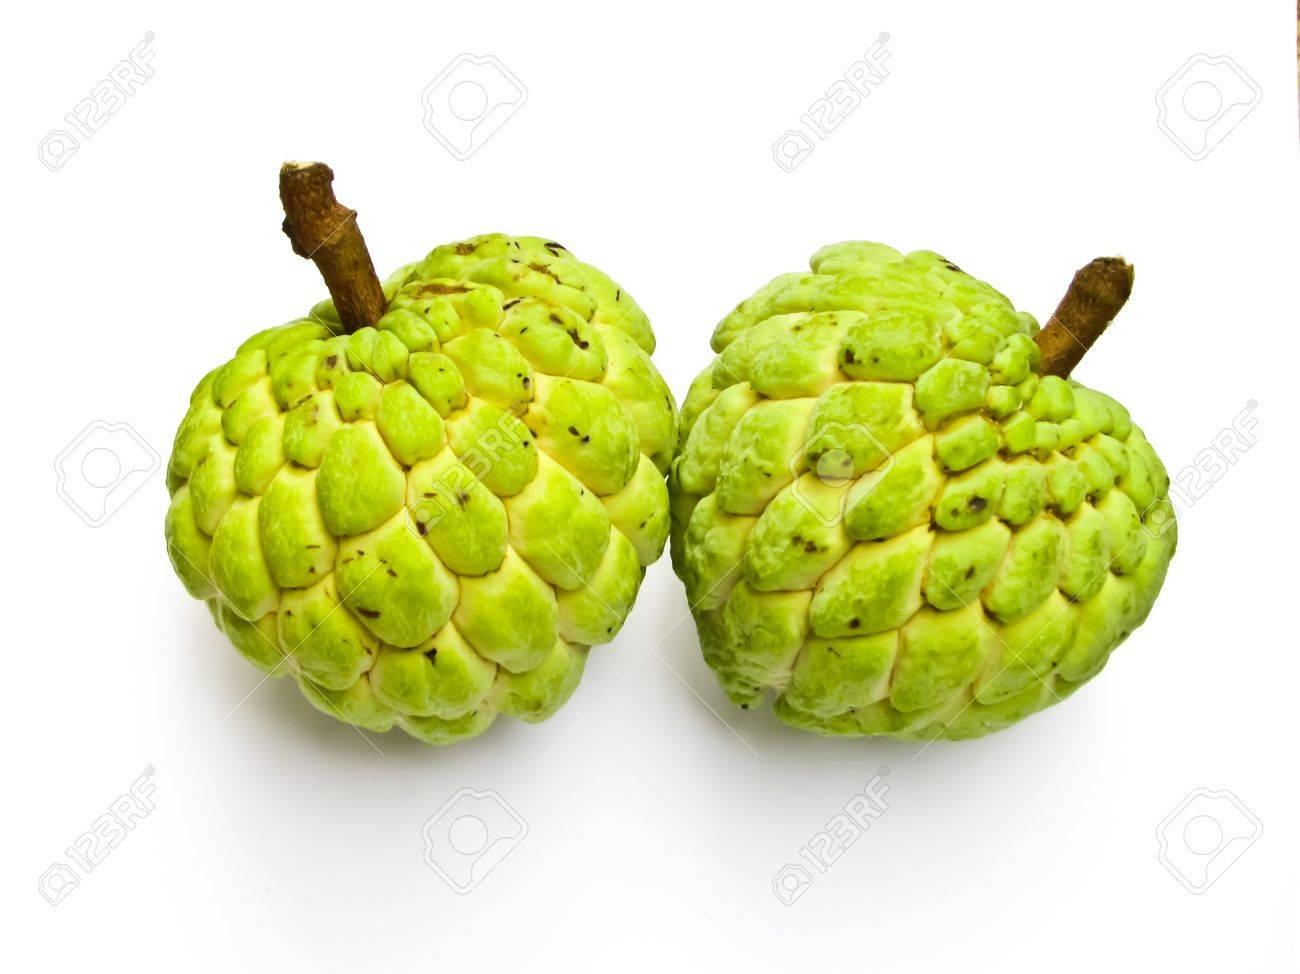 two custard-apples on white background Stock Photo - 10018770